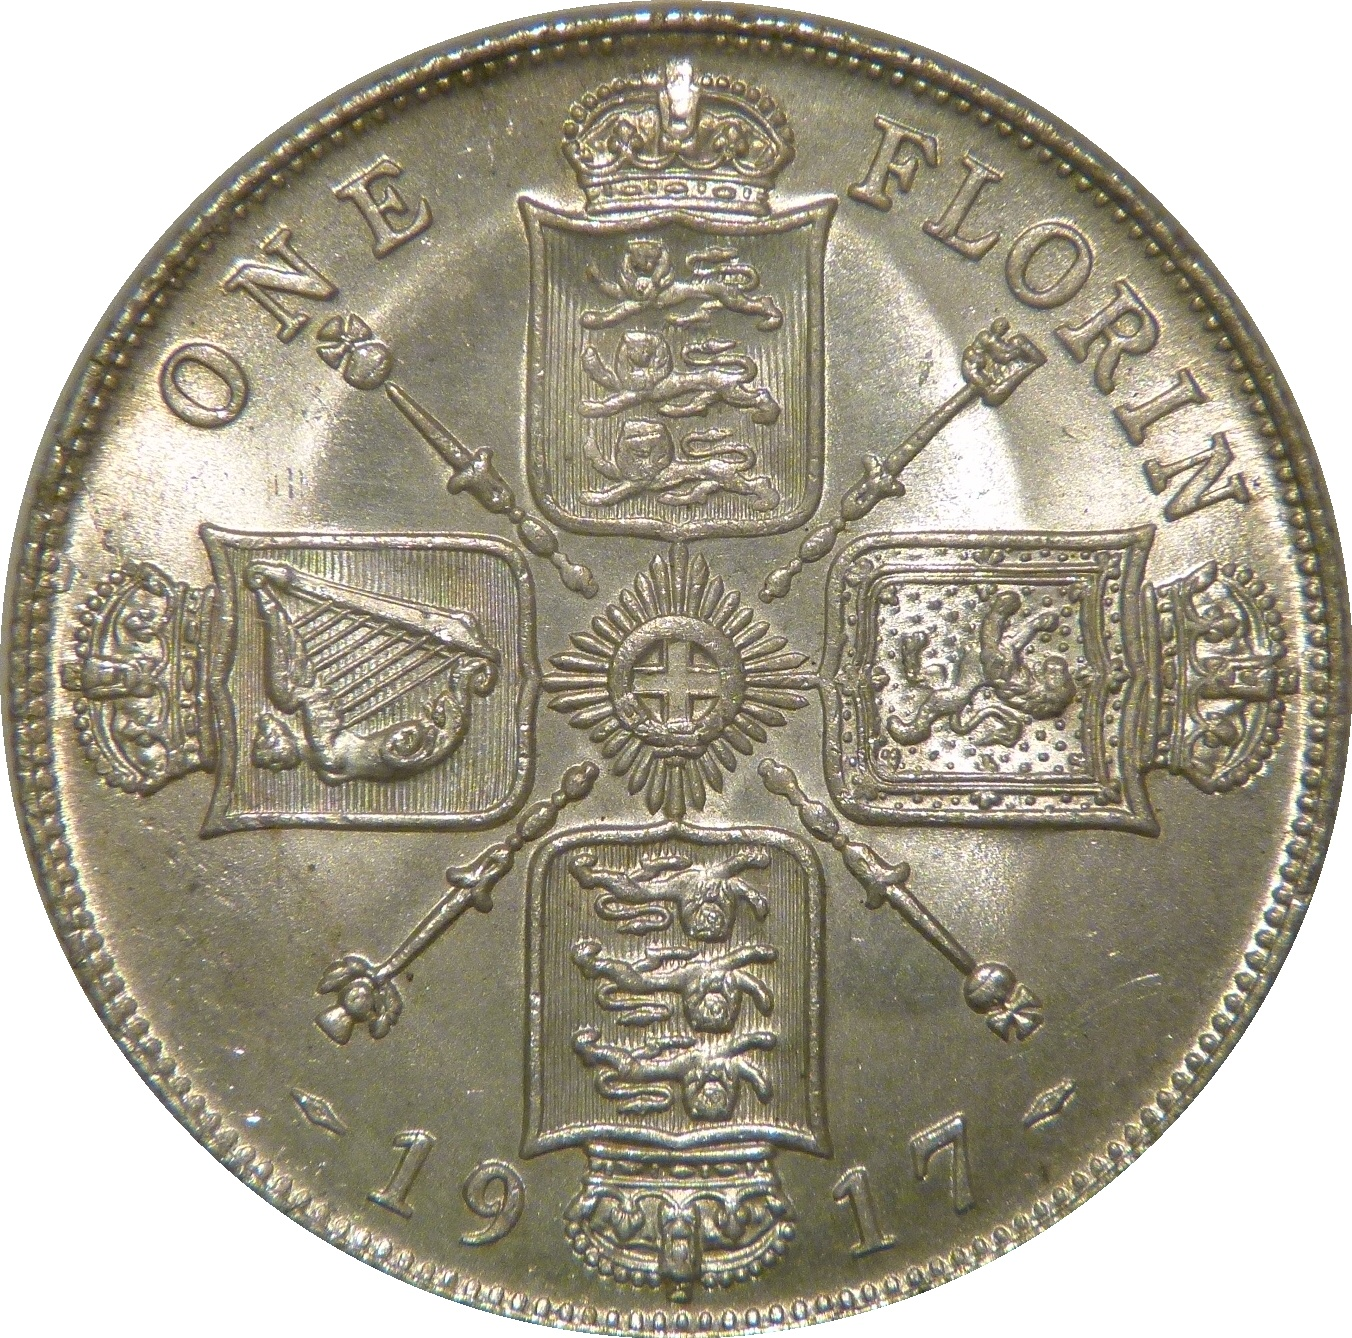 1917 Florin, CGS 78(MS 63-64), UNC, George V, ESC 936, UIN 33216